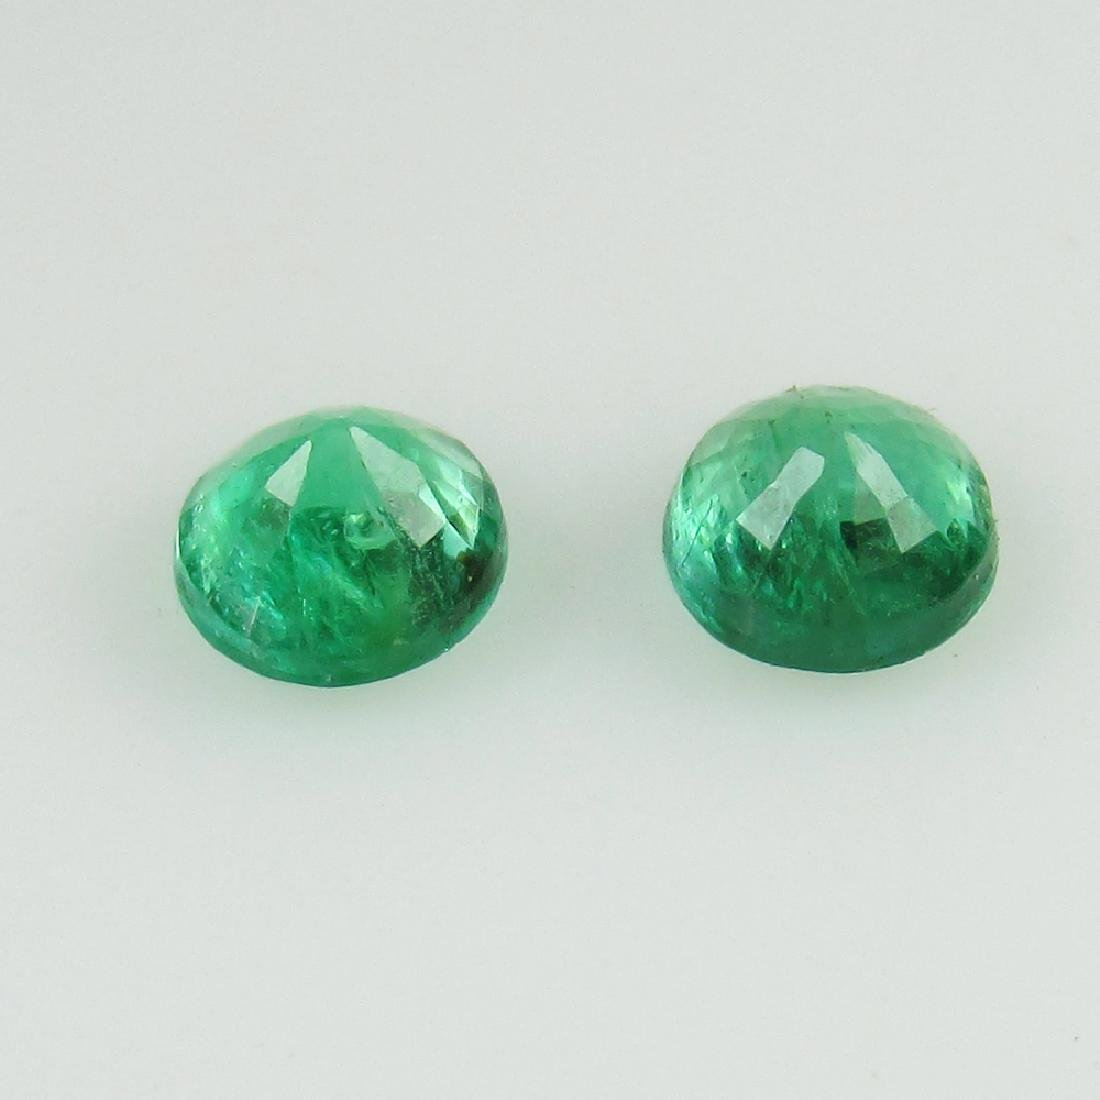 0.55 Ct Genuine Loose Zambian Emerald 4.2 mm Round Pair - 2